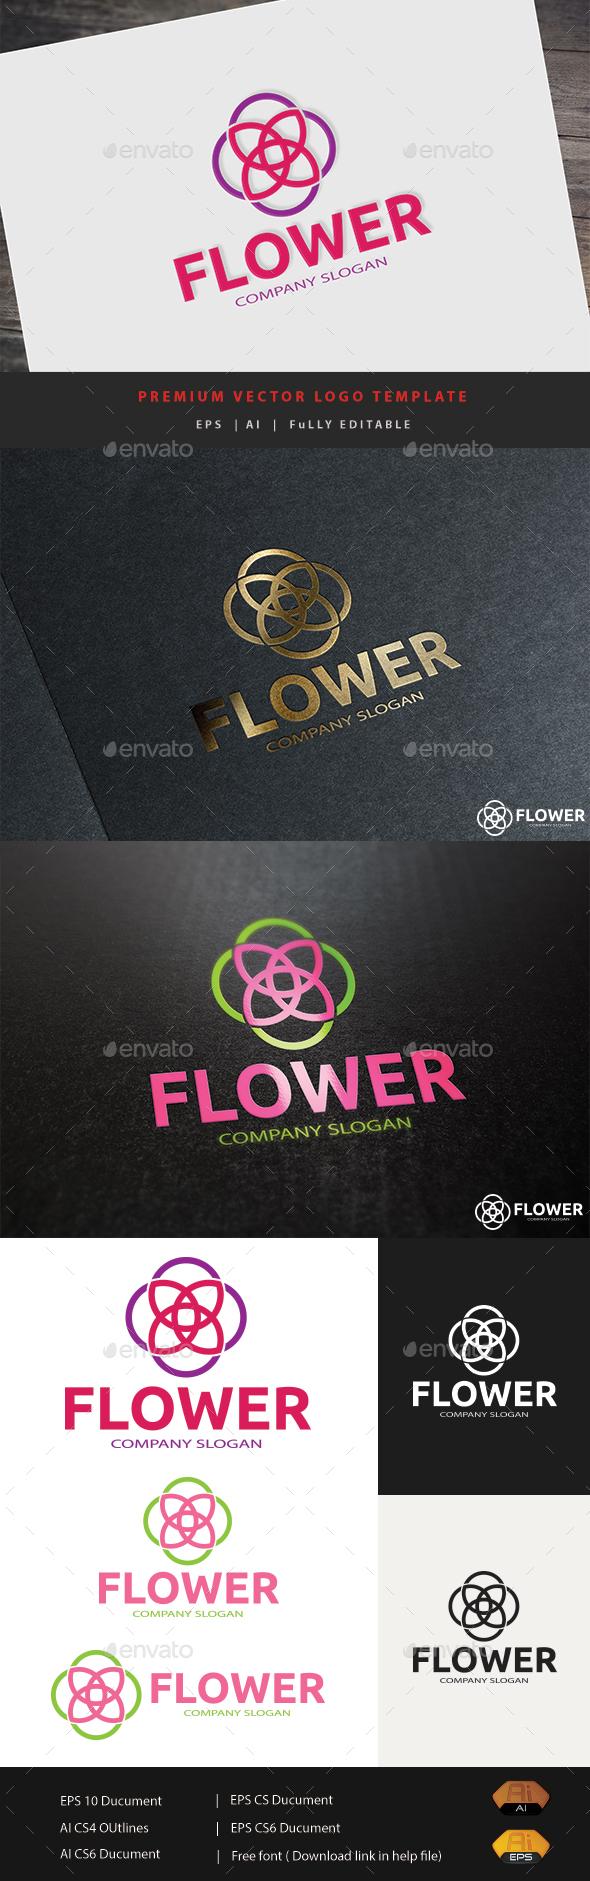 Flower Logo - Abstract Logo Templates